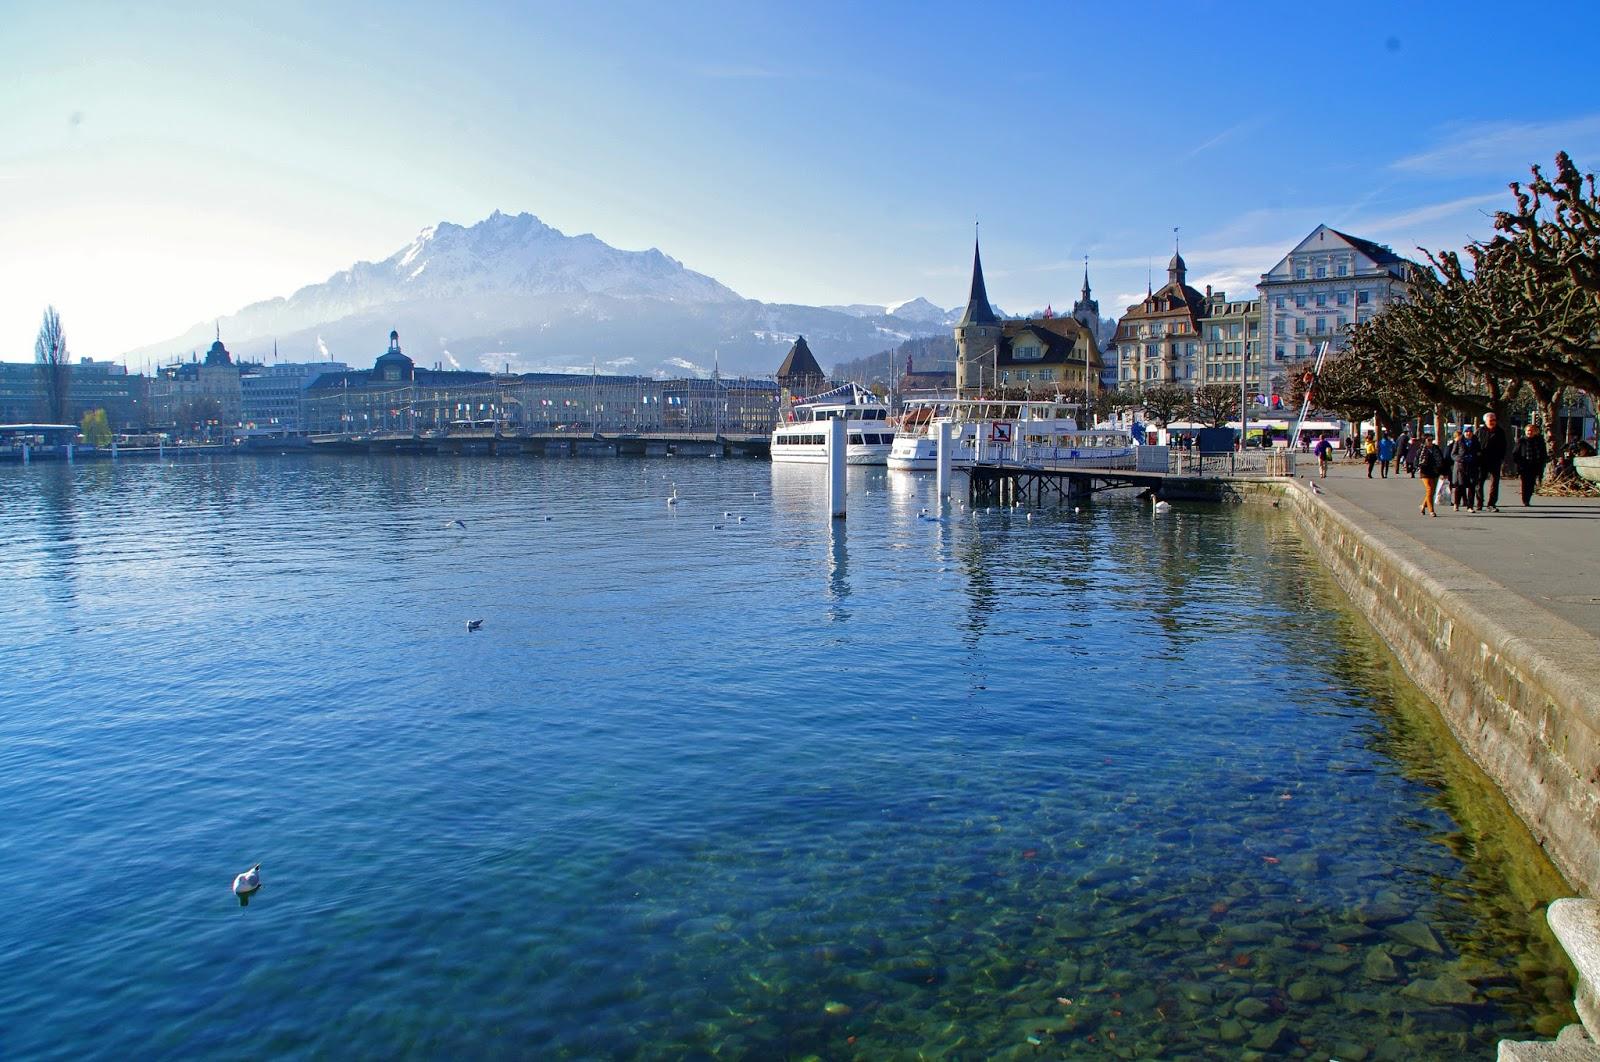 Hotel Schweizerhof Luzern Location Lakeside